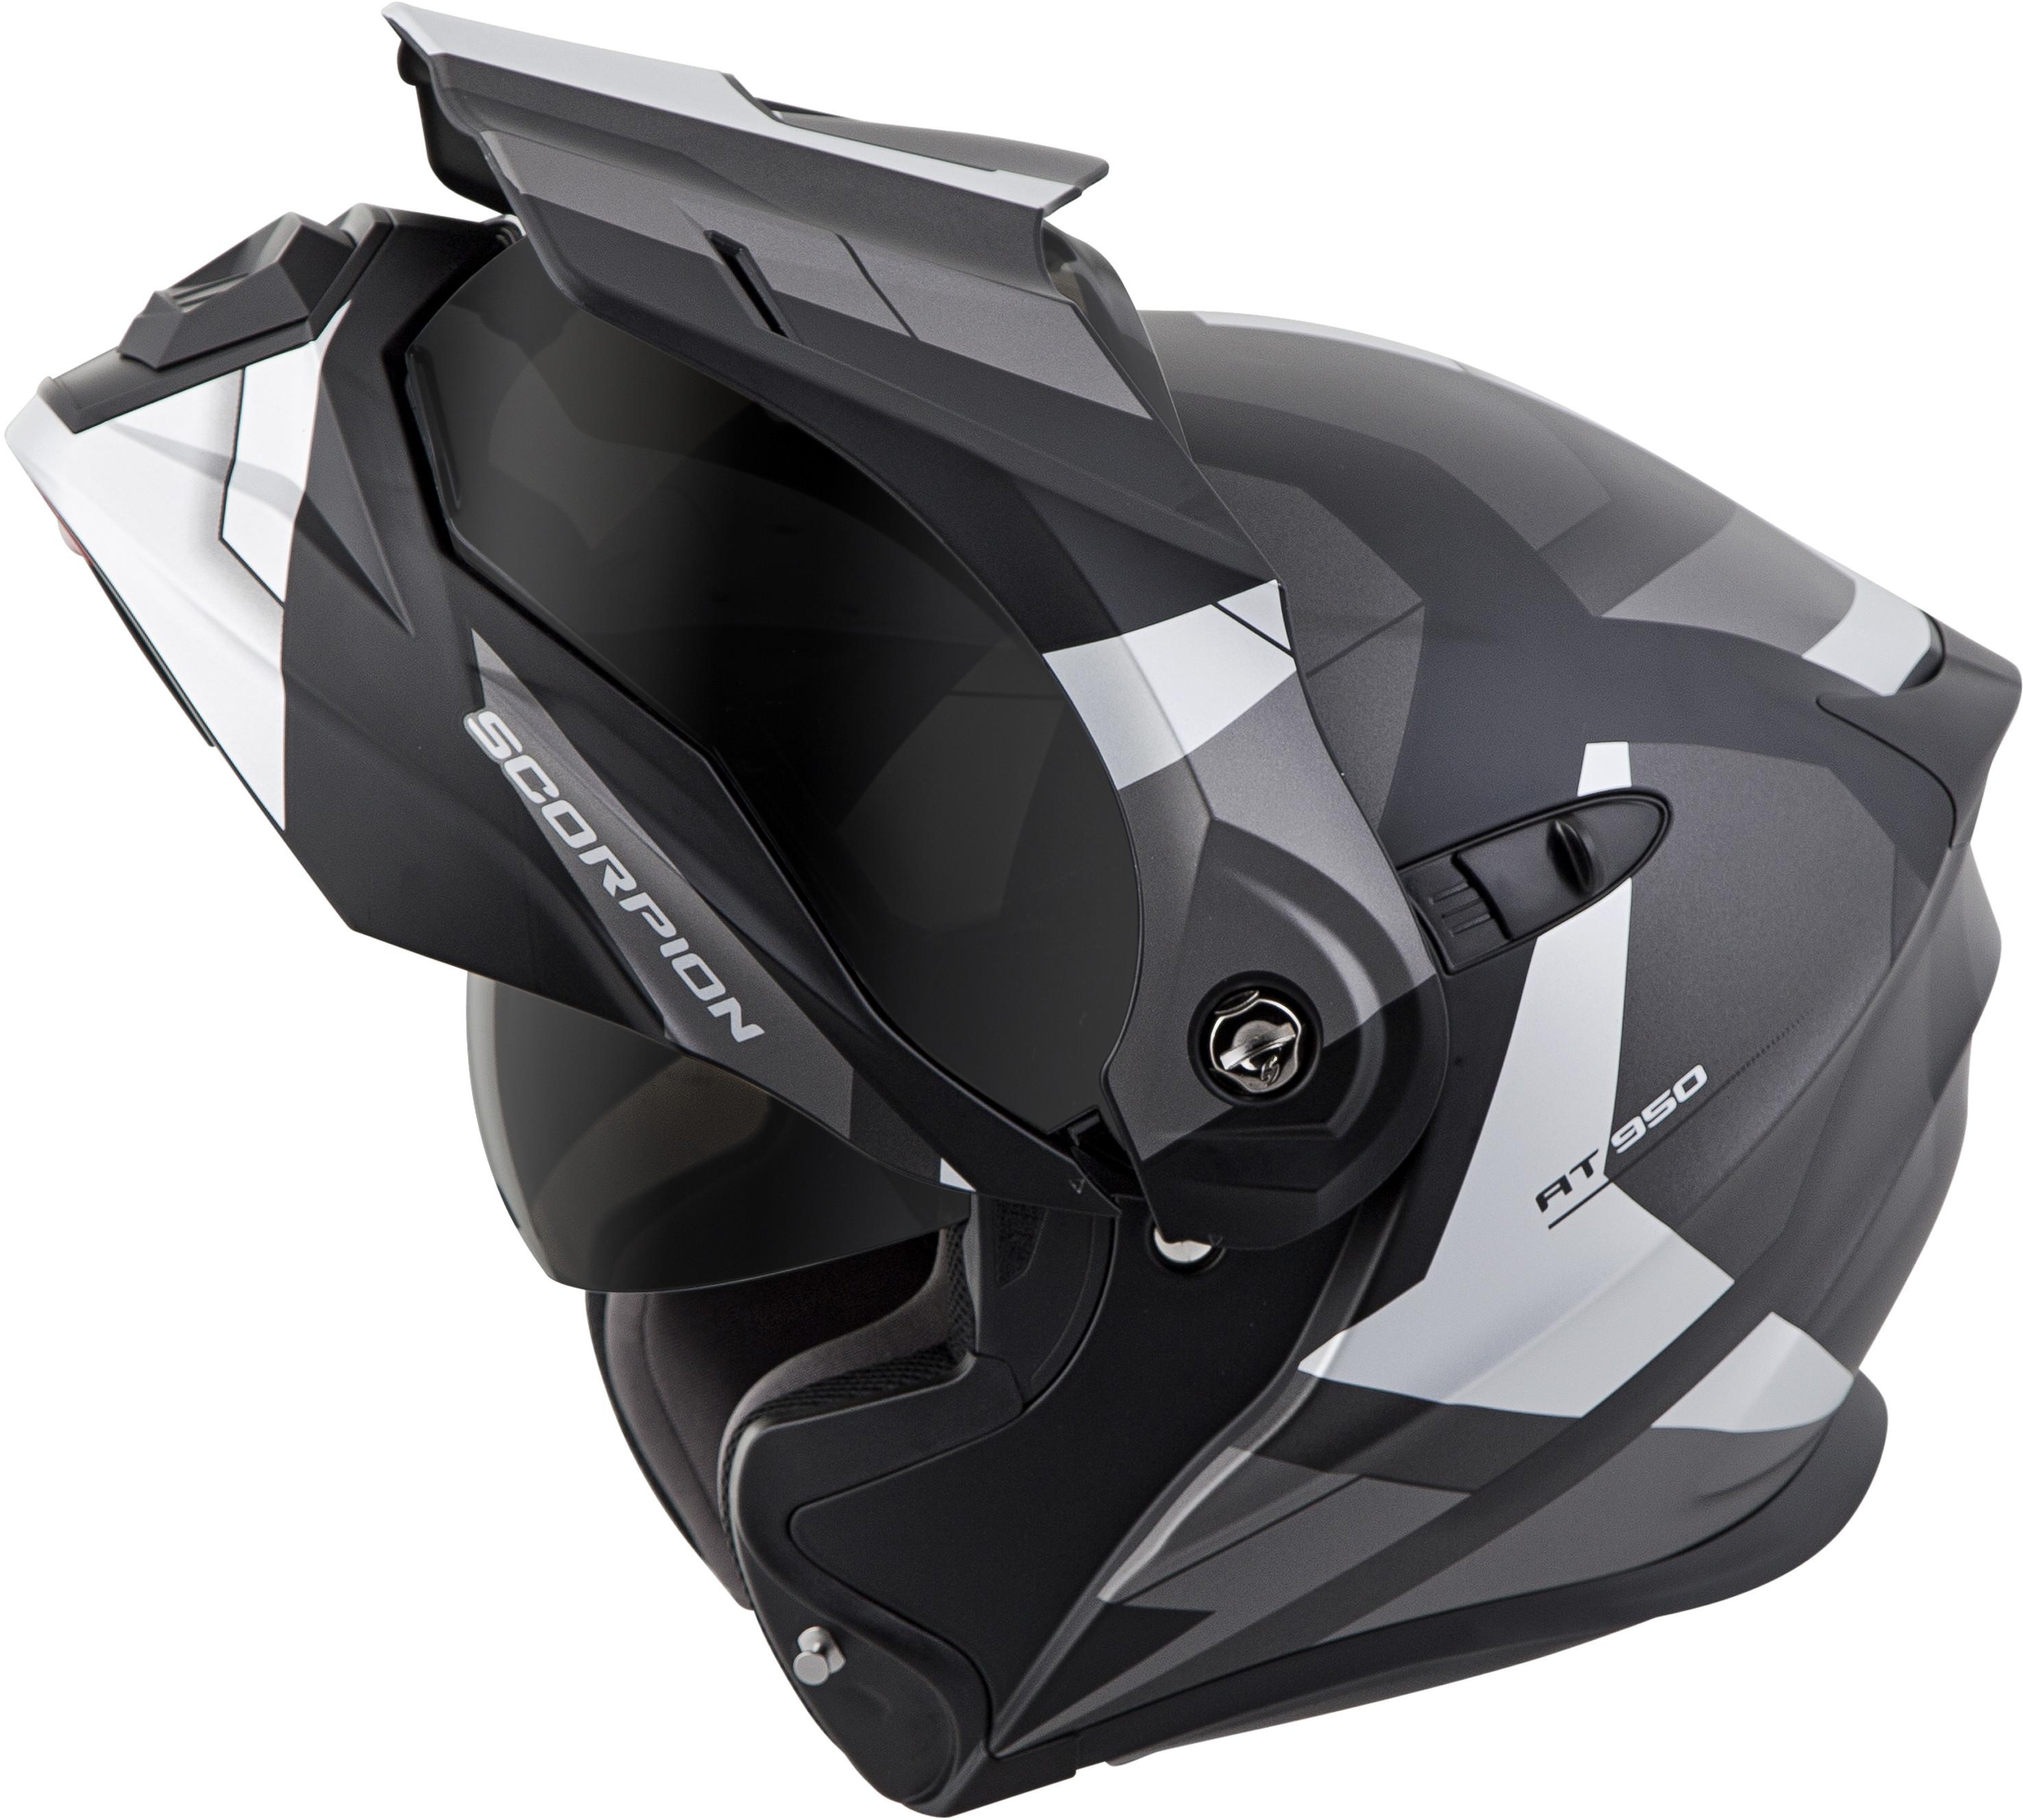 for-Scorpion-Helmet-EXO-AT950-Neocon-Snow-Helmet-with-Dual-Lens-Shield miniature 34